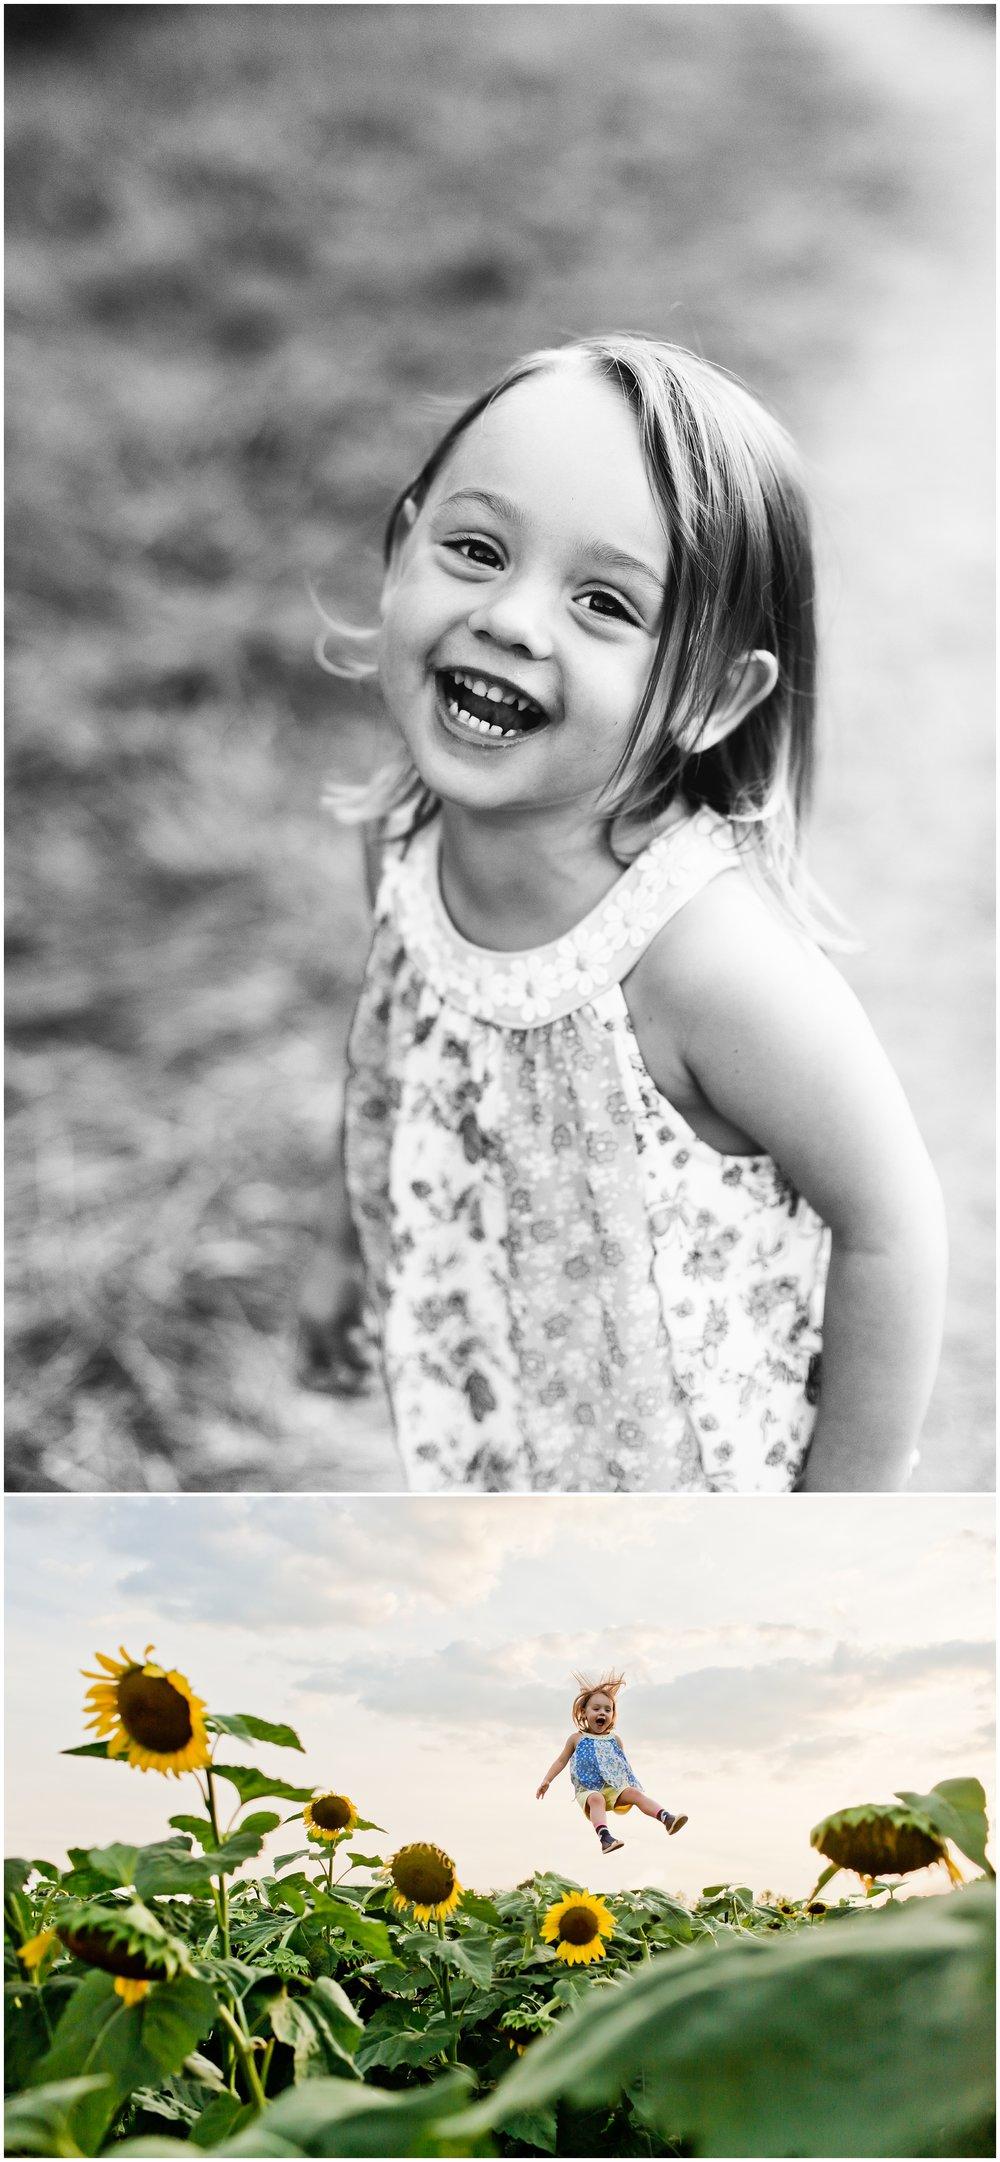 mckee-beshers-sunflowers-family-photography-8.jpg